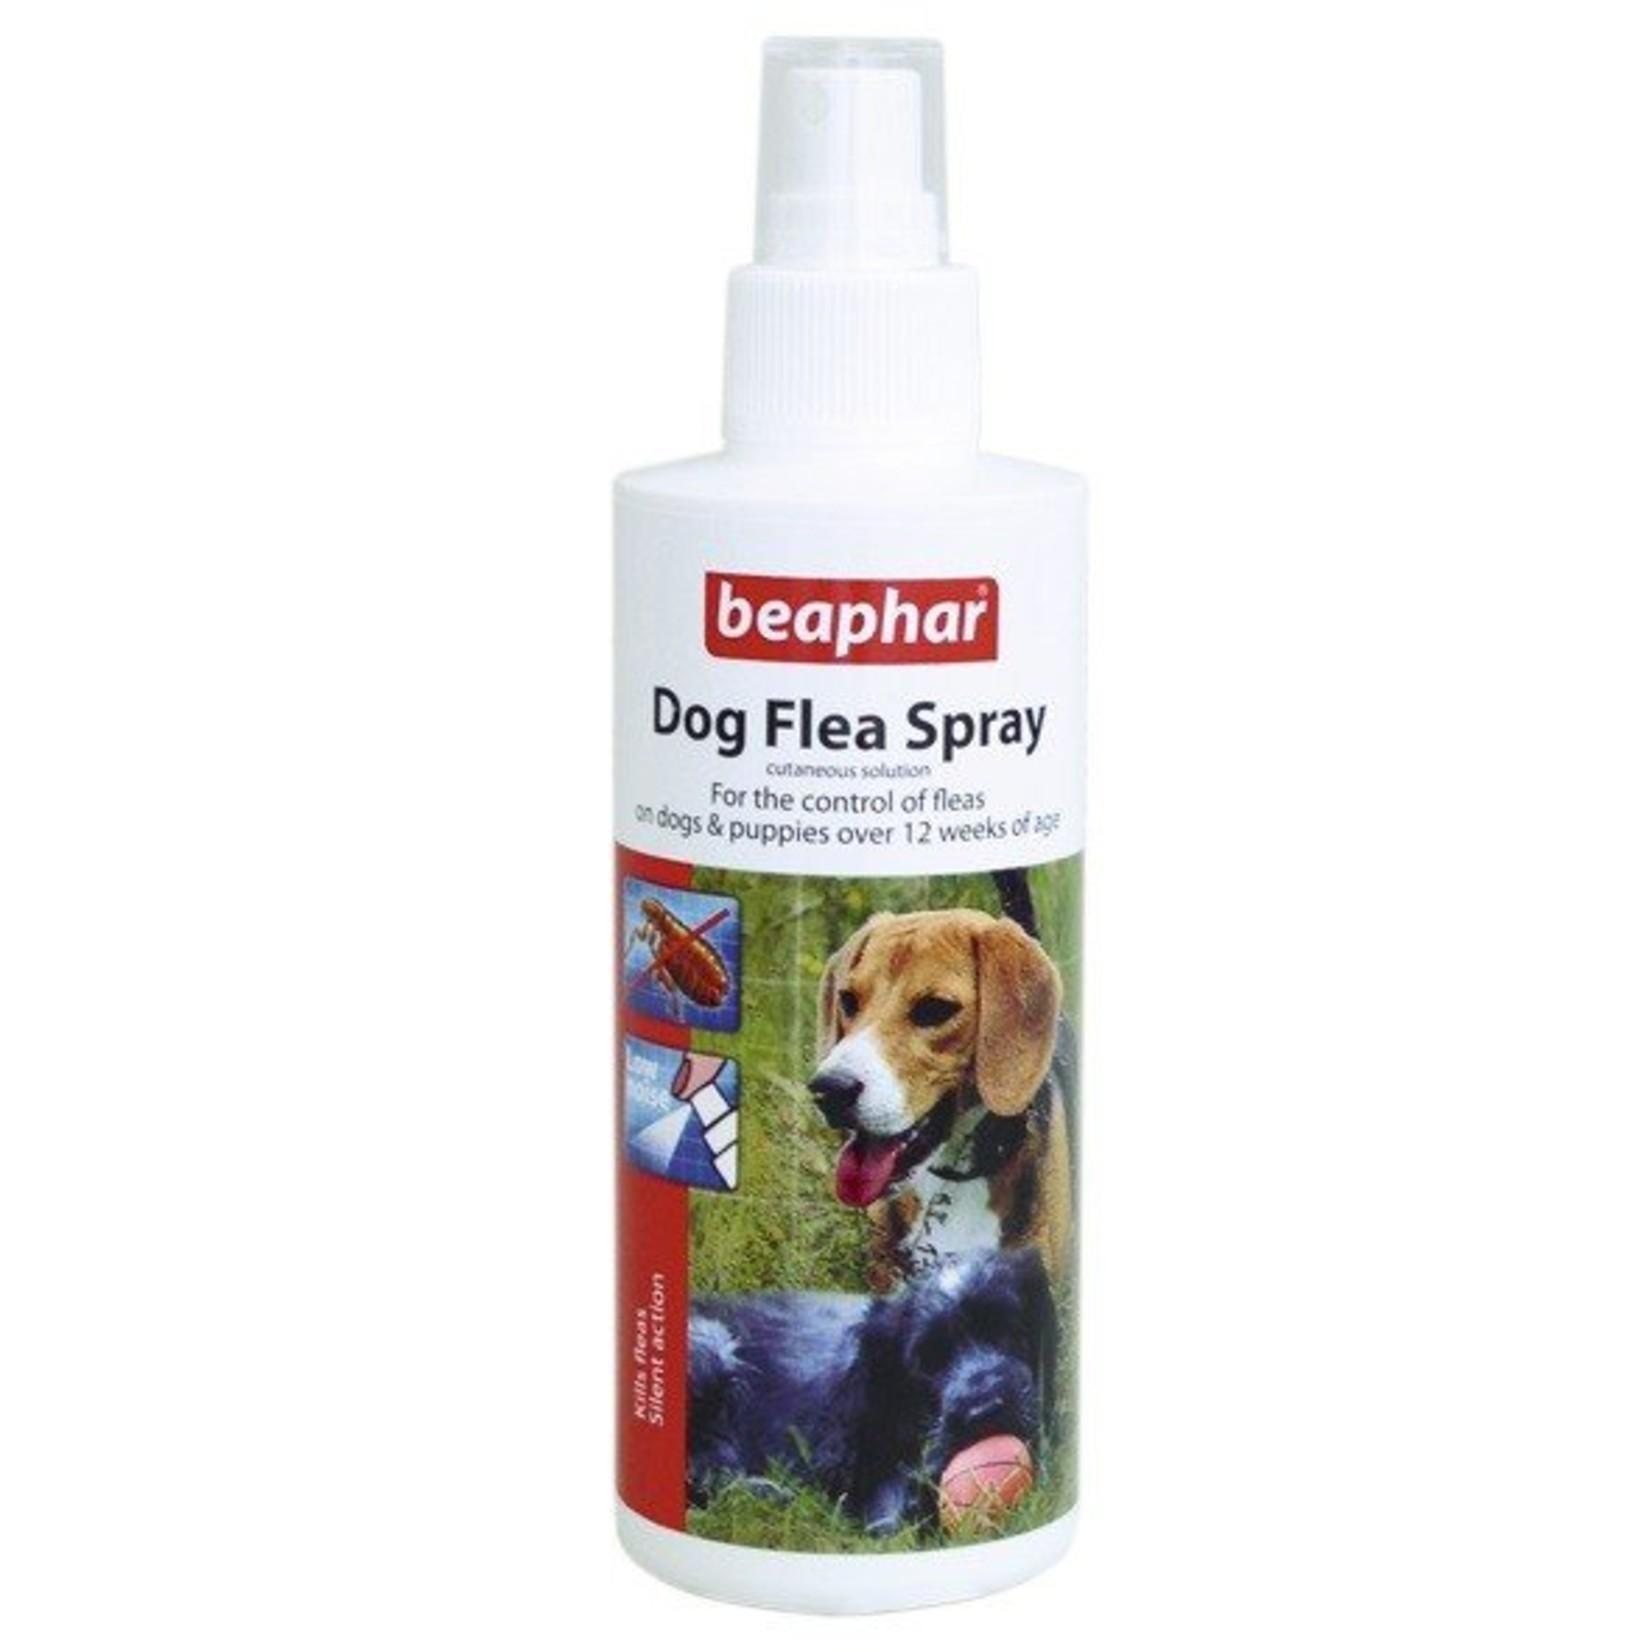 Beaphar Dog & Puppy Flea Spray, 150ml